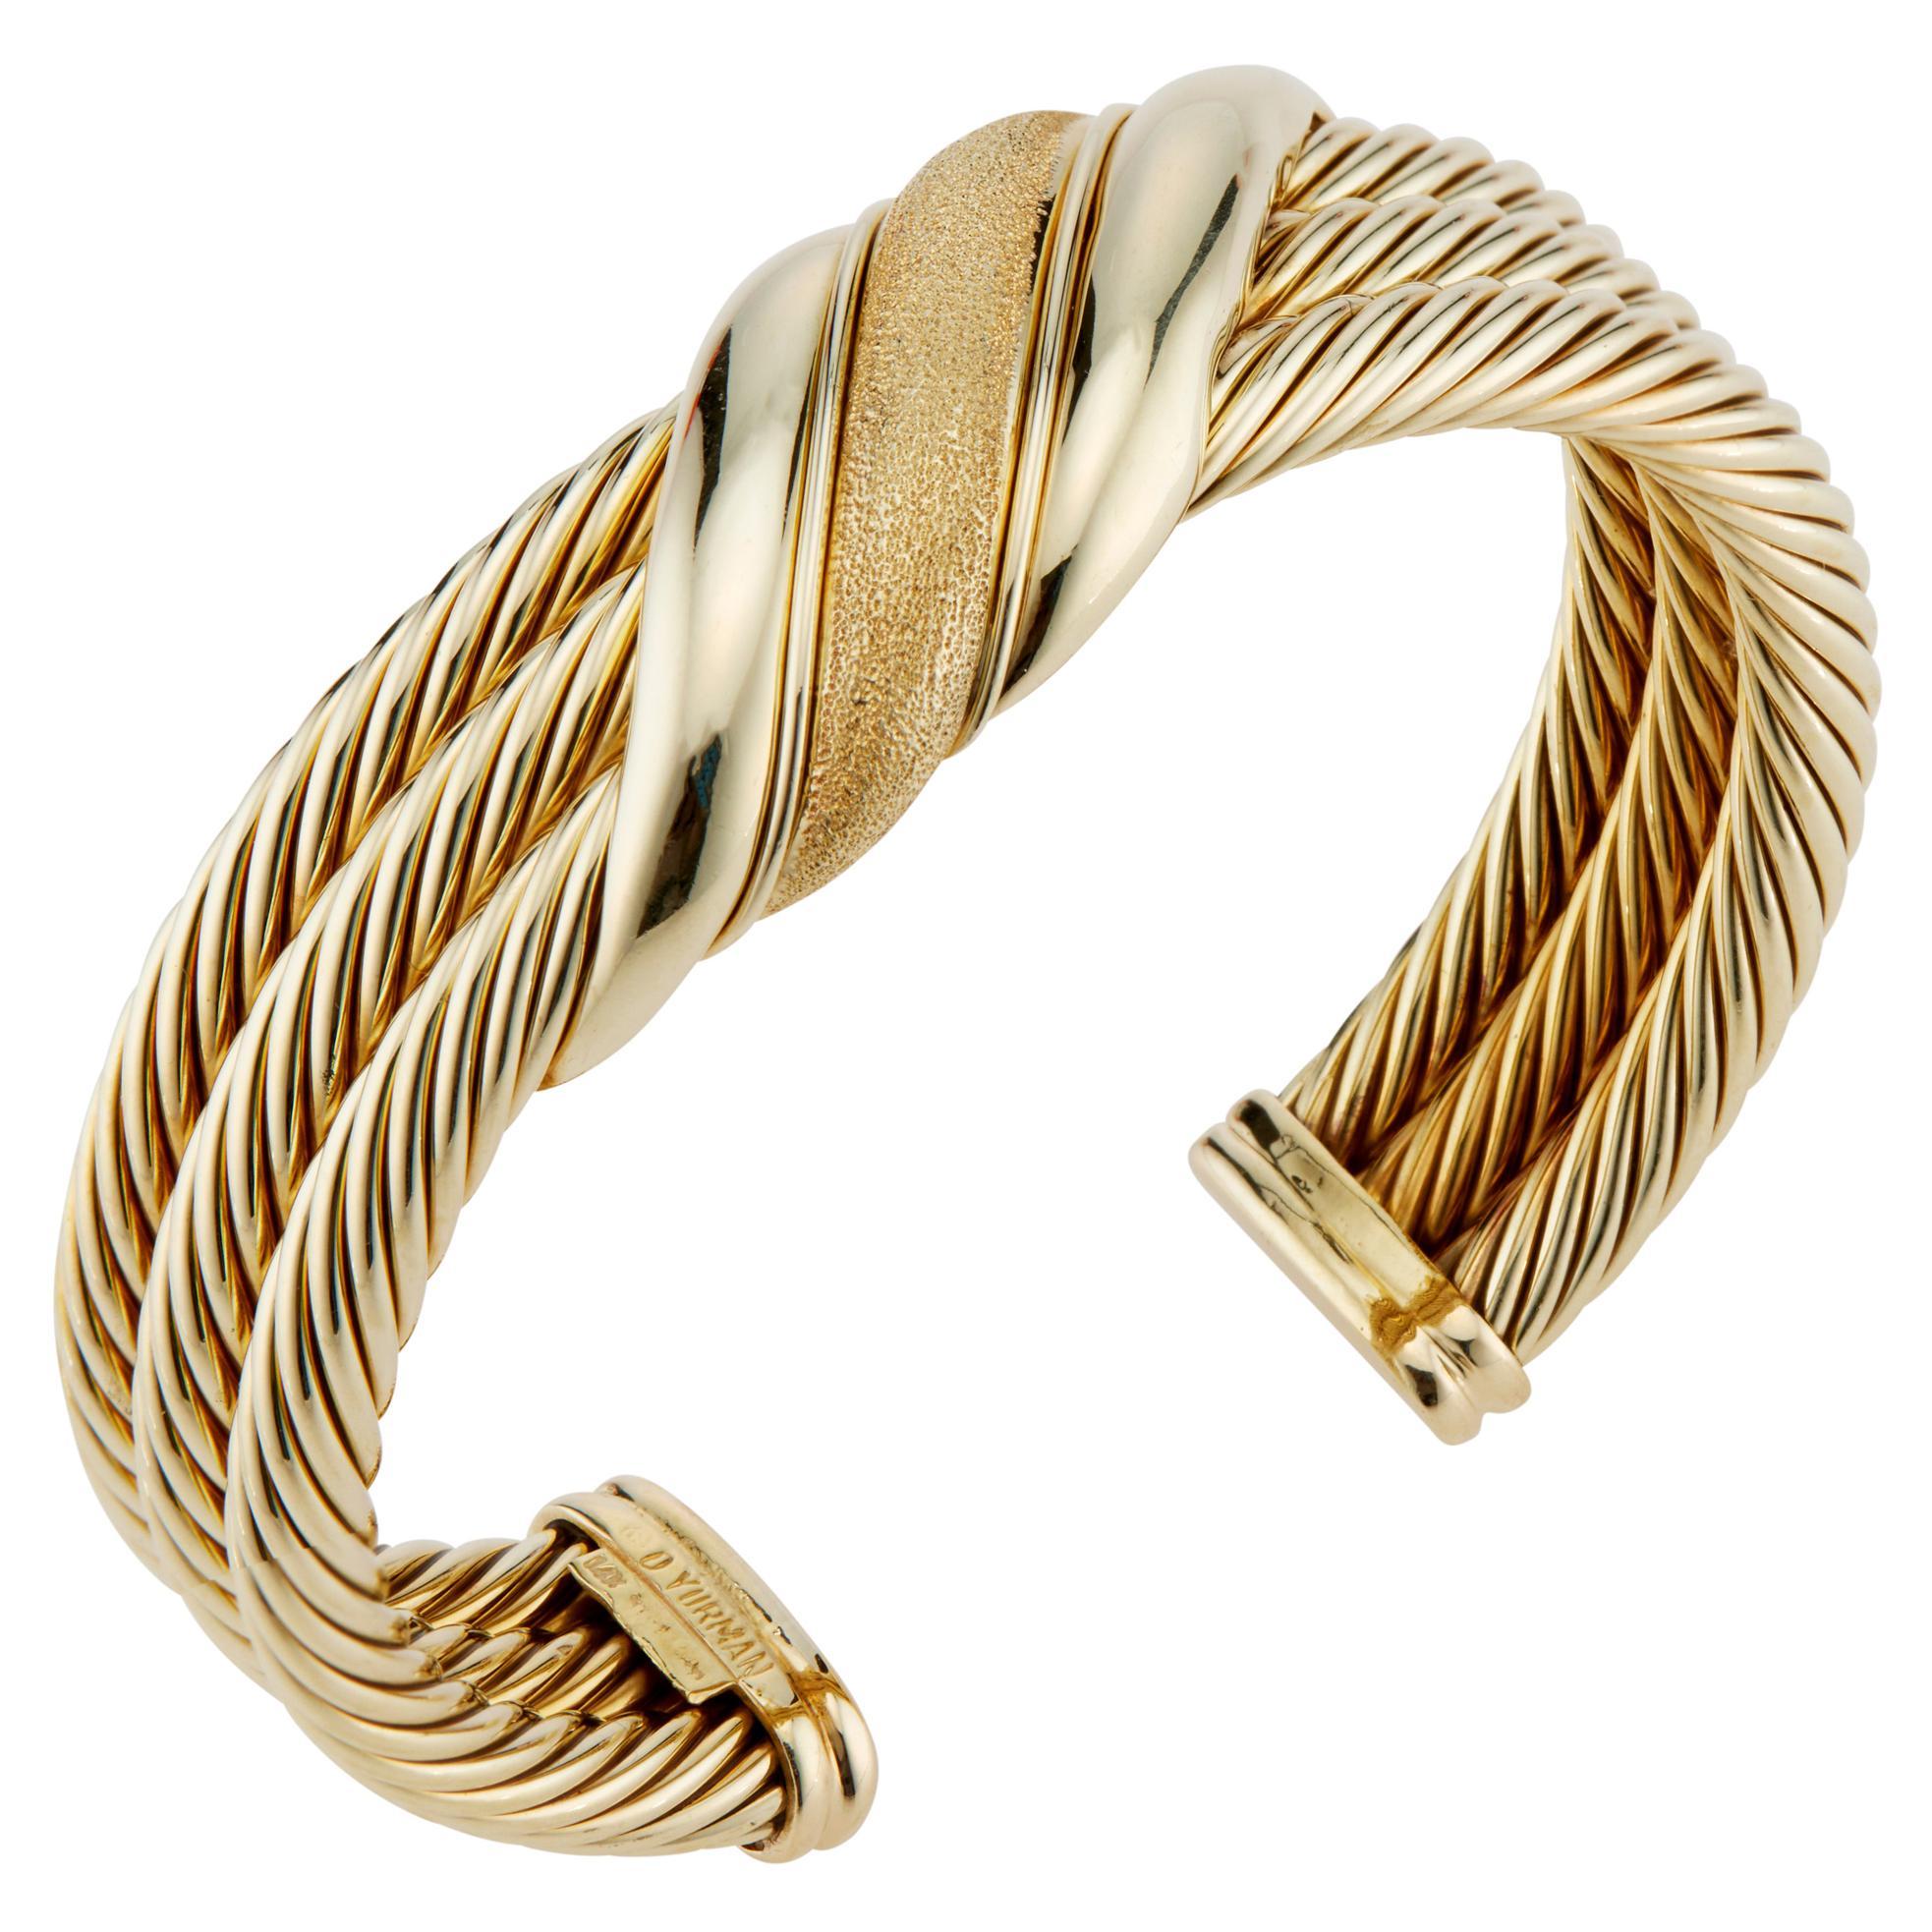 David Yurman Yellow Gold Triple Cable Band Cuff Bracelet